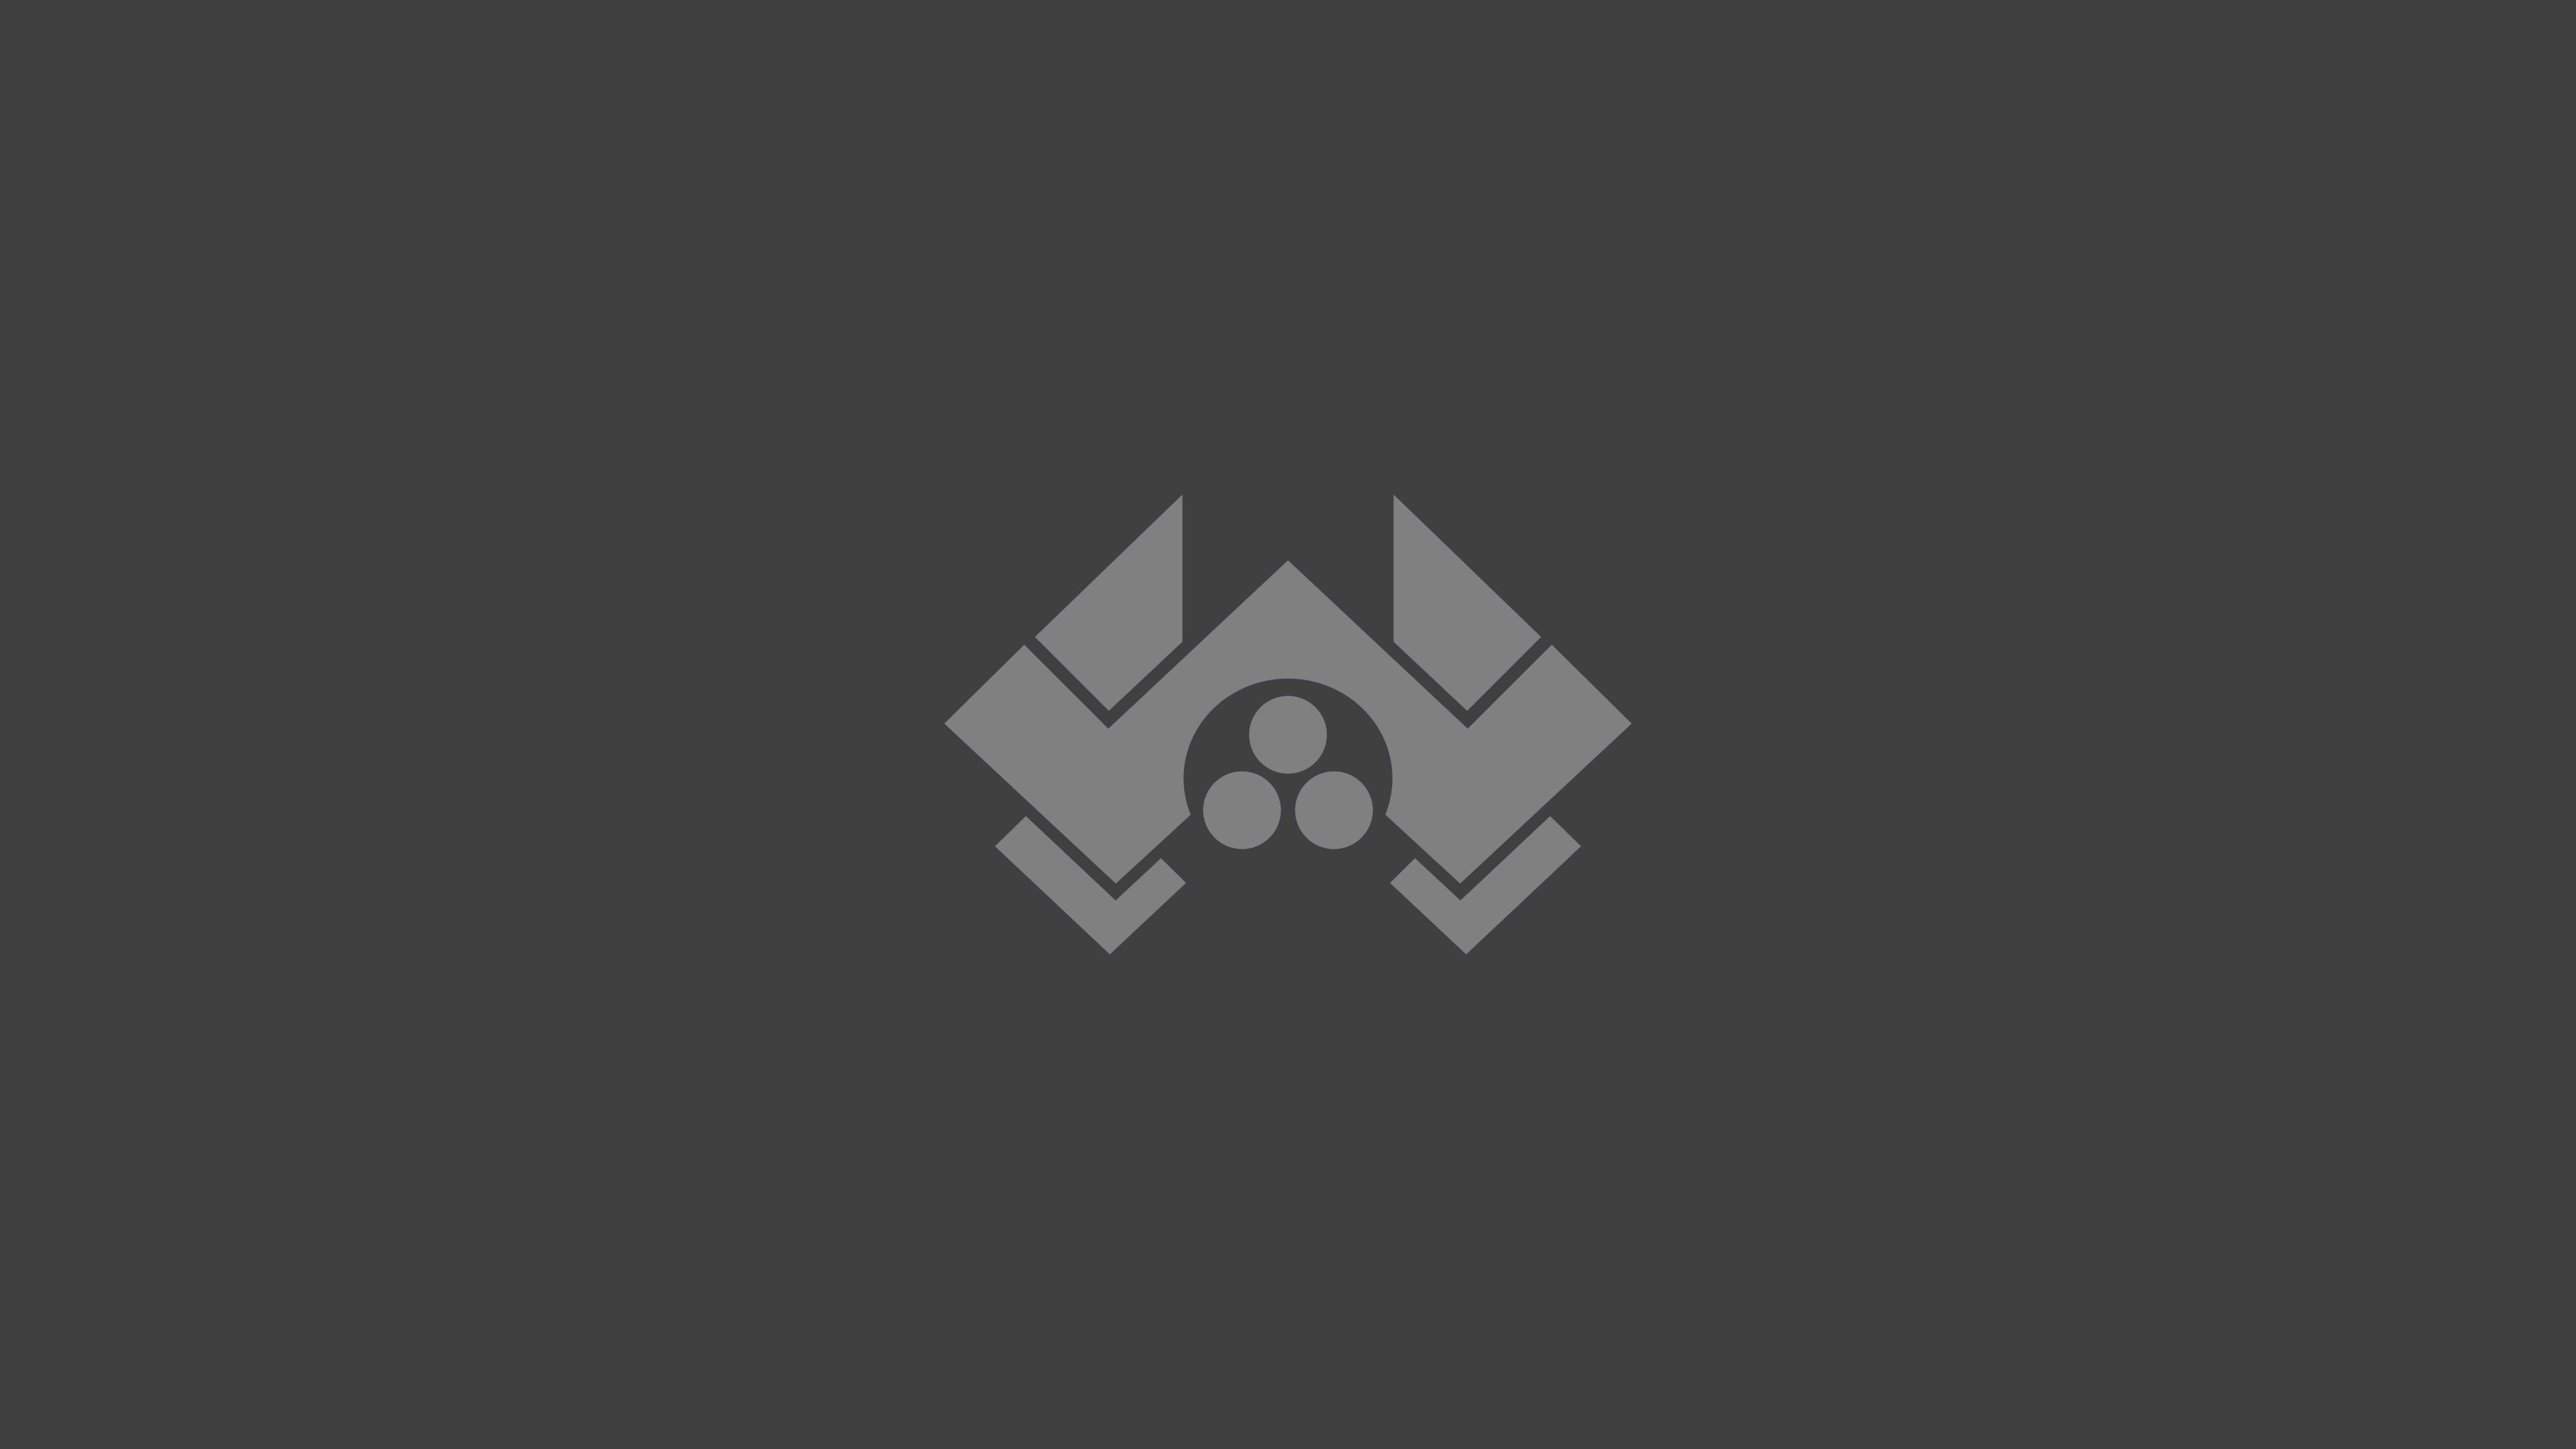 Nakatomi Plaza [3840x2160] Wallpaper, Investing